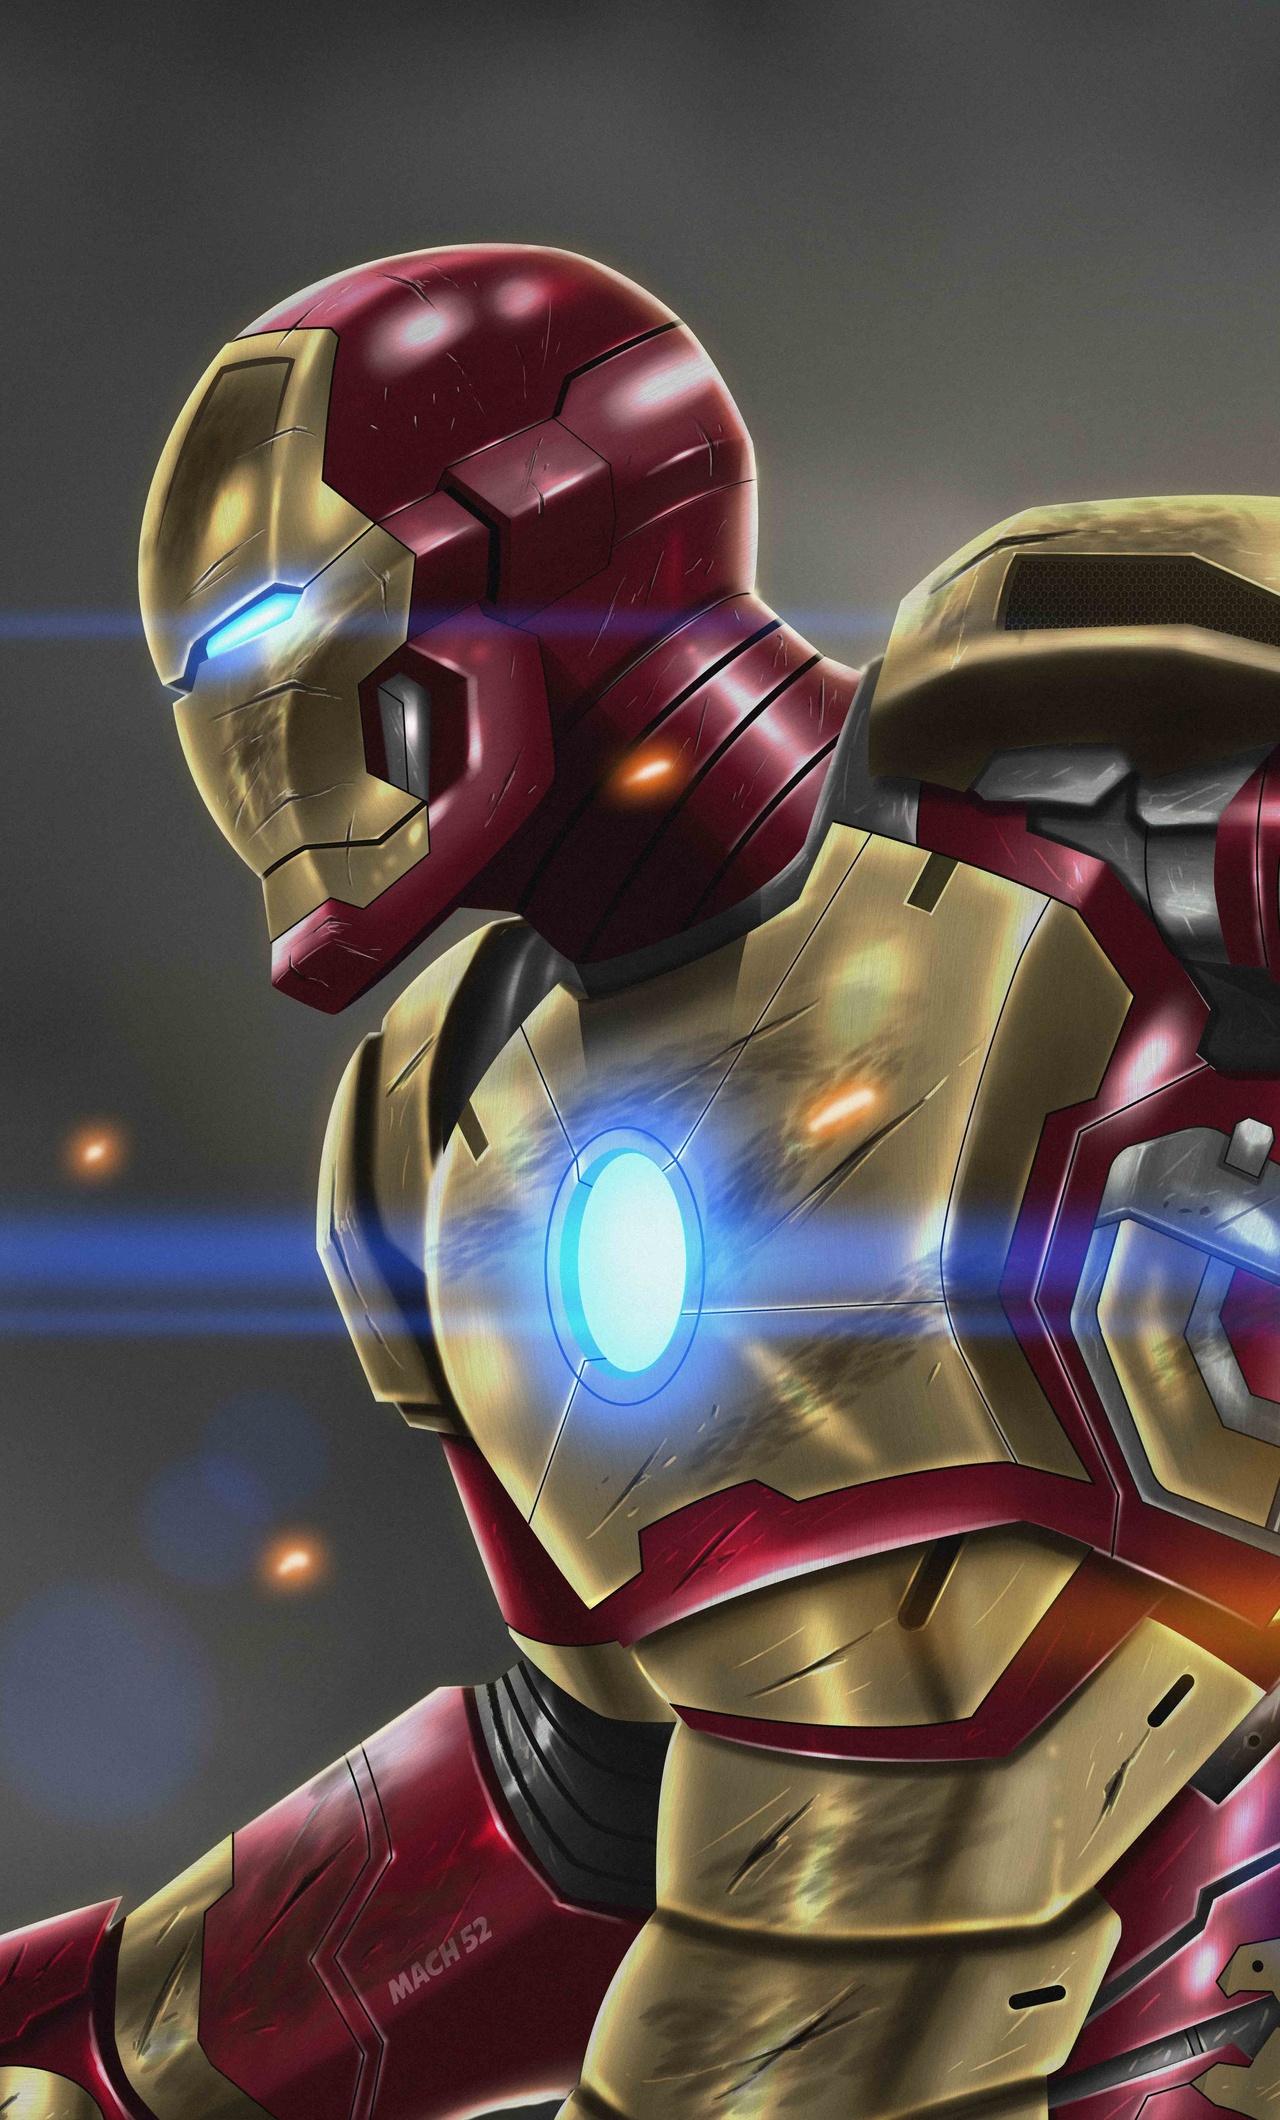 iron-man-at-war-10k-artwork-zj.jpg